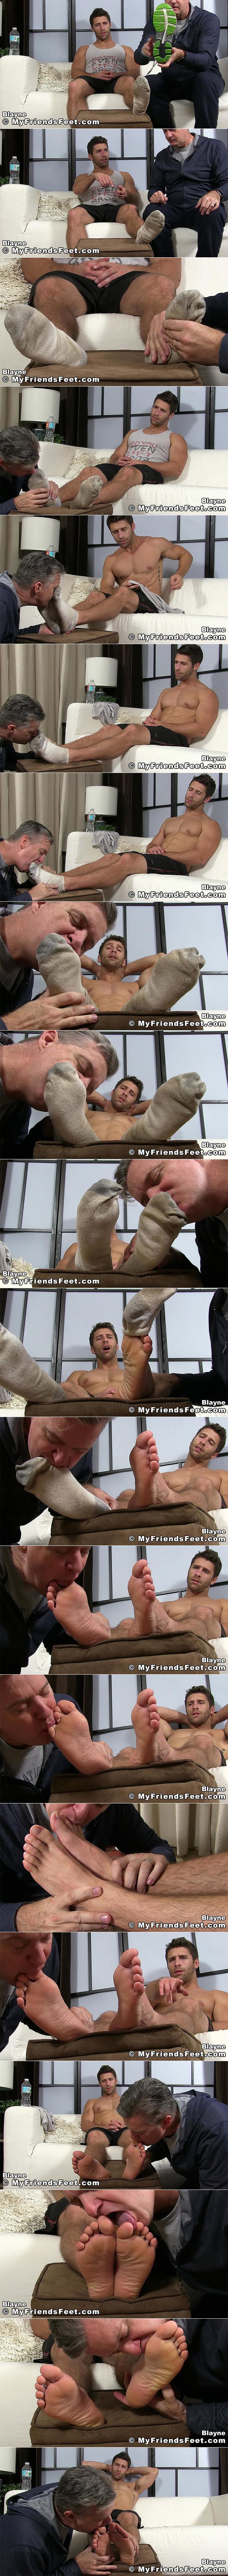 Myfriendsfeet Blayne Foot Worship Sweaty Dirty Smelly Socks Male Feet Soles Toes Licking Sucking Toes